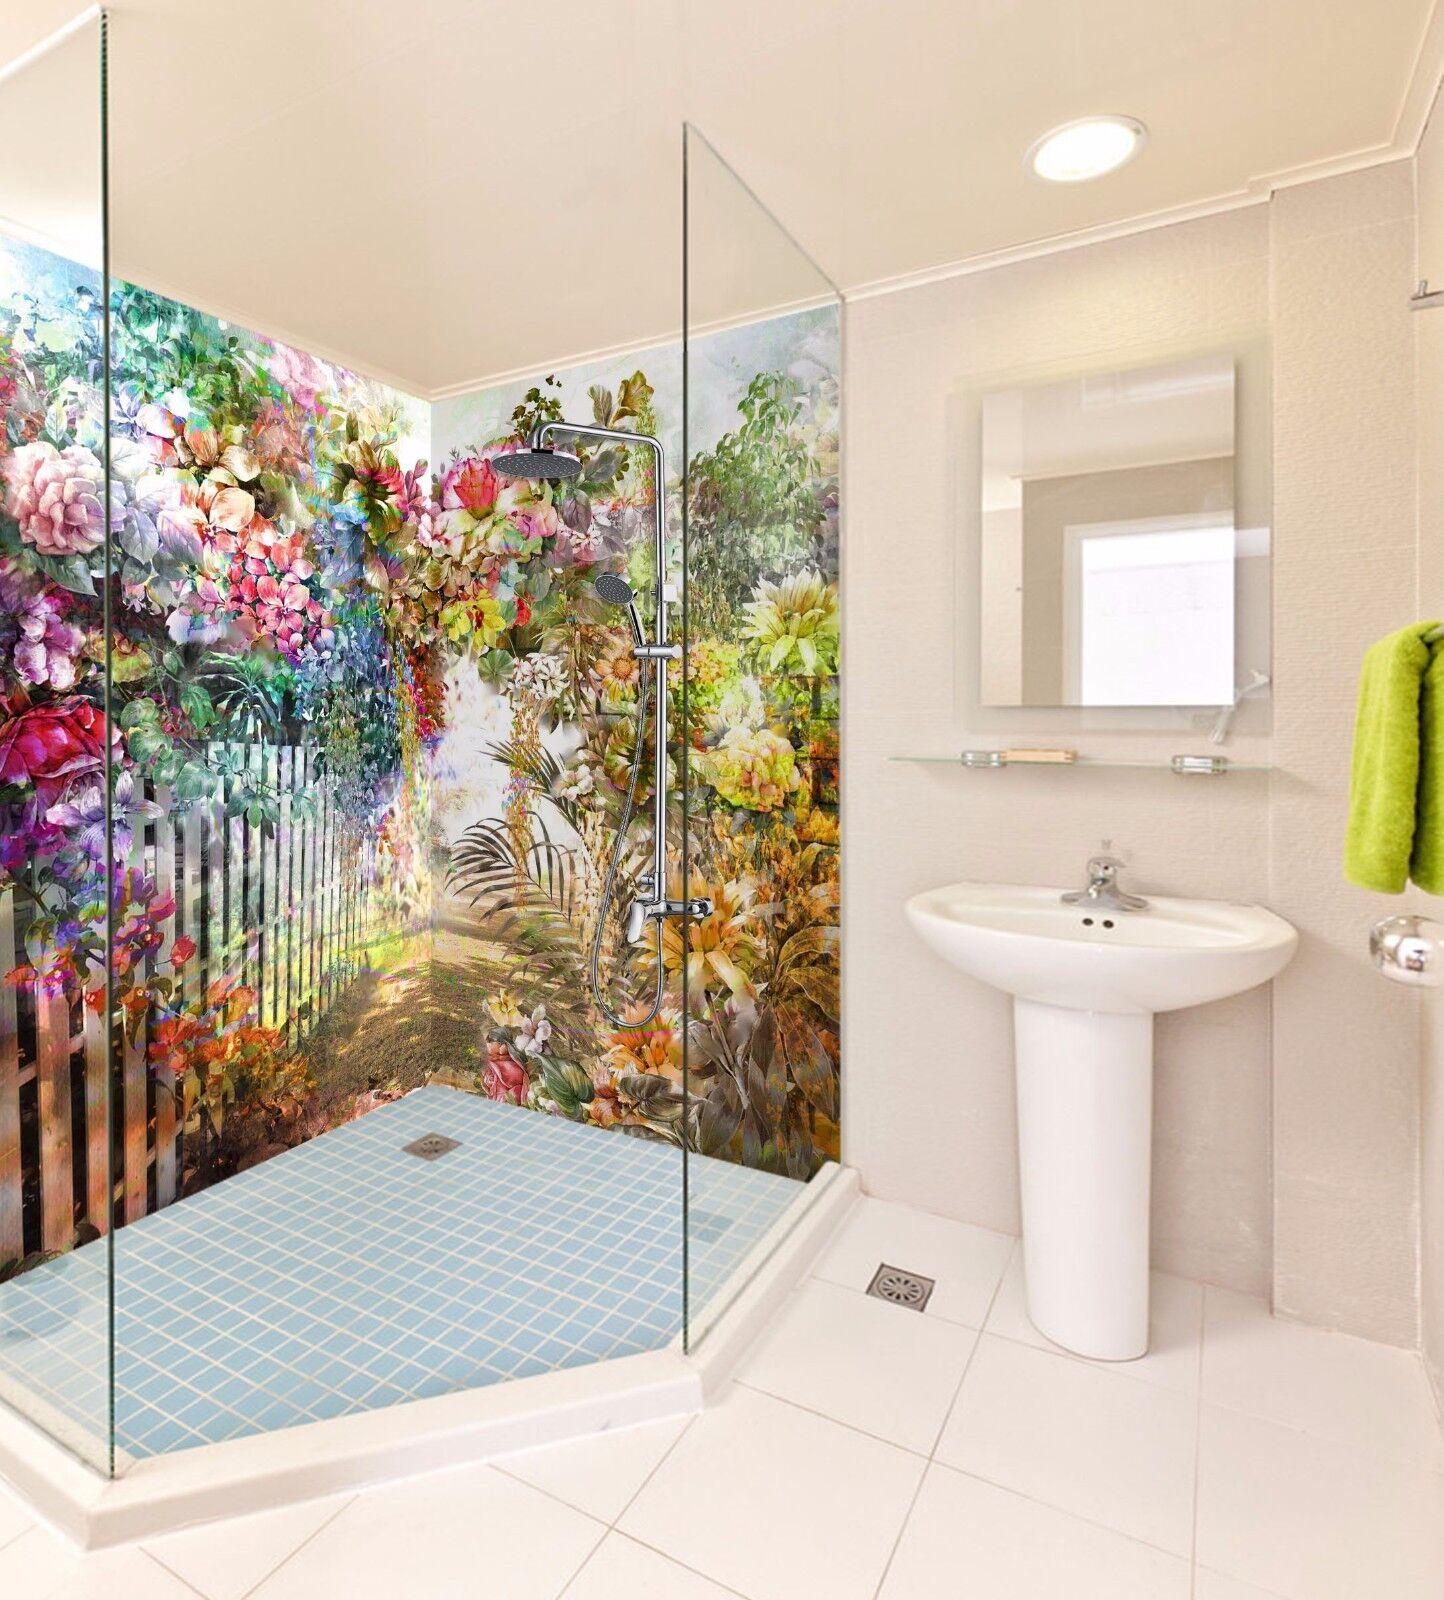 3D Flower 7048  WallPaper Bathroom Print Decal Wall Deco AJ WALLPAPER AU